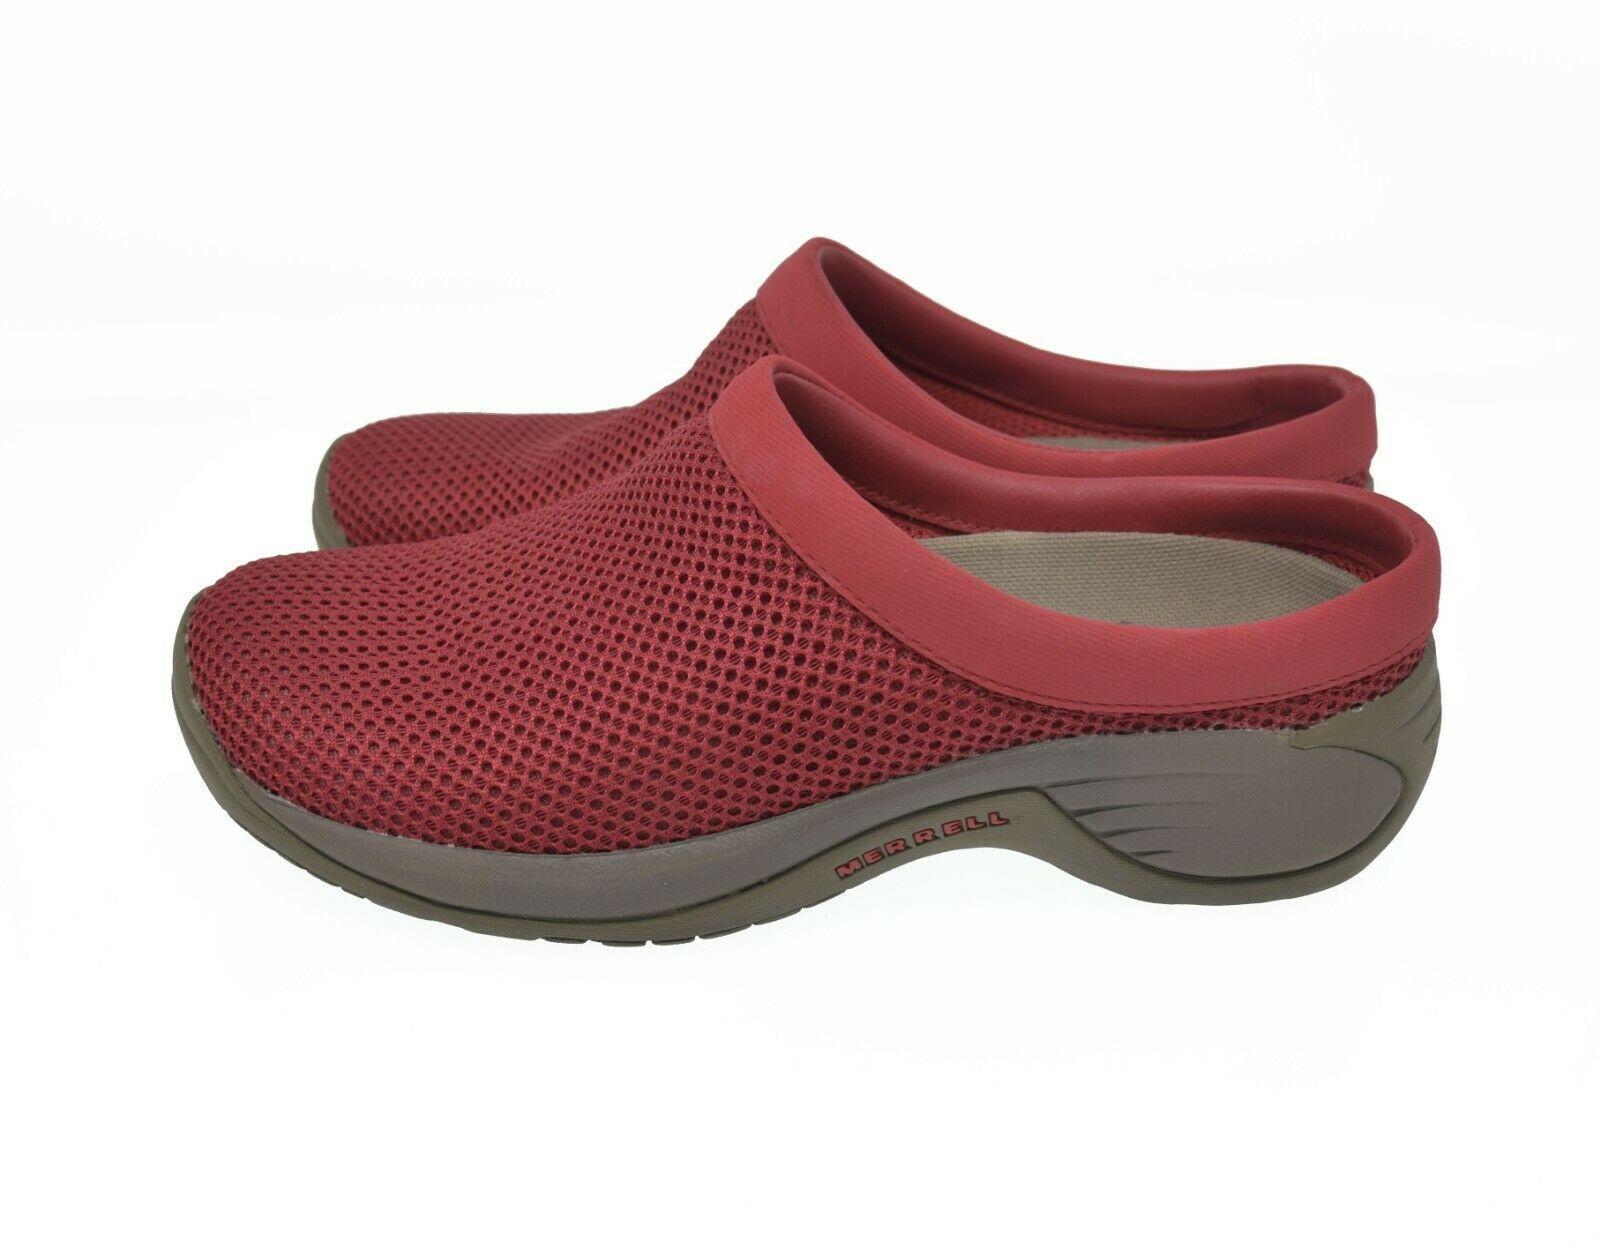 Merrell Q Form Air Cushion Women's Sz 7.5 EU 38 Red Ortholite Slip On Comfort